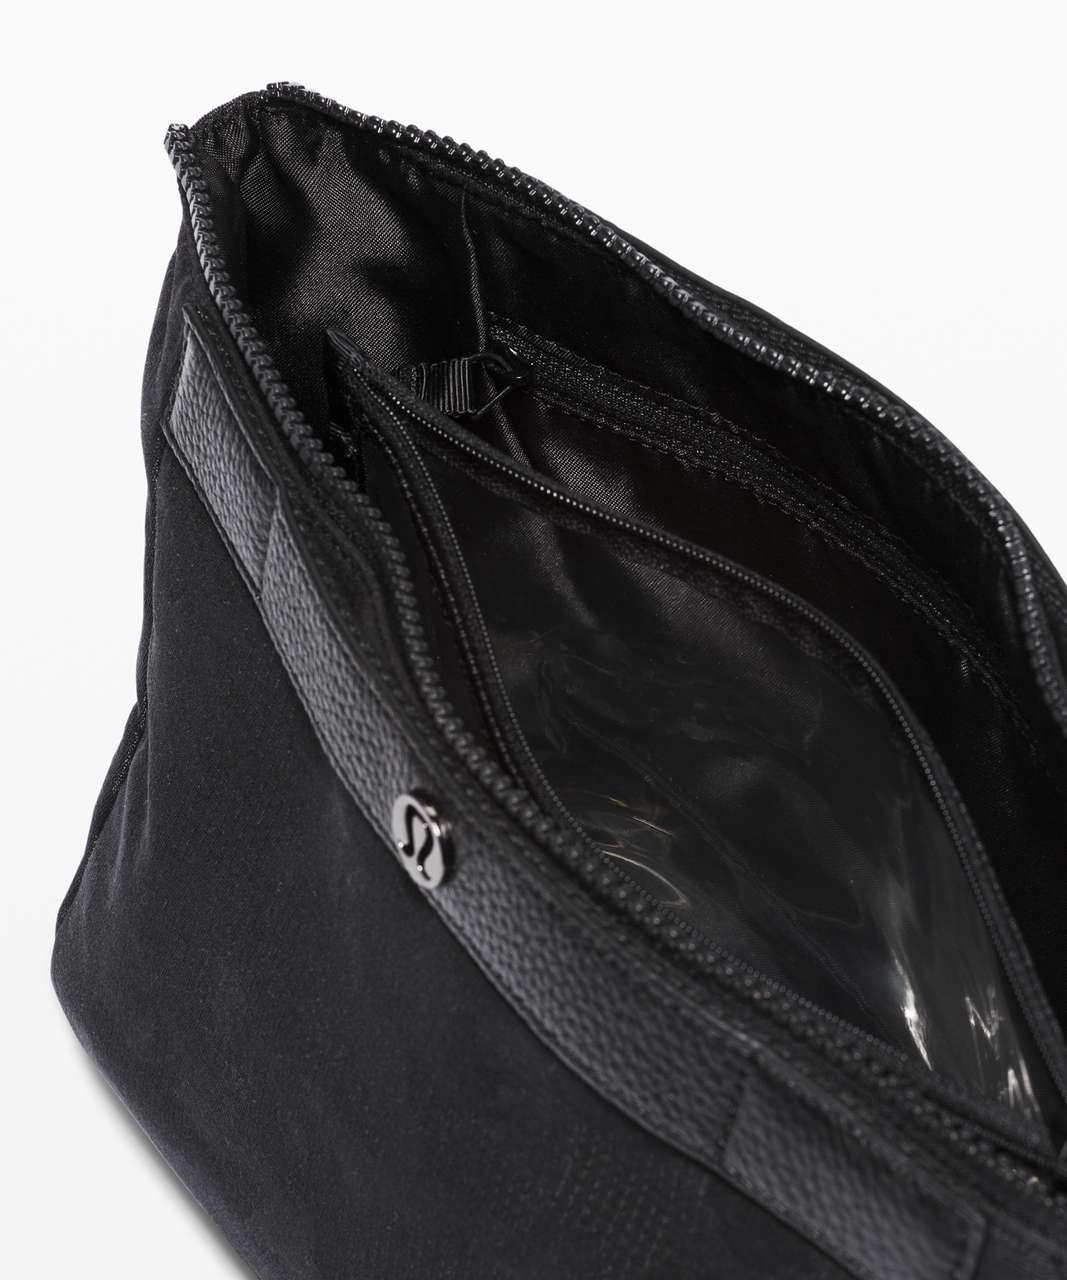 Lululemon Travel Easy Kit *4.5L - Heritage Grid Camo Jacquard Micro Black Deep Coal